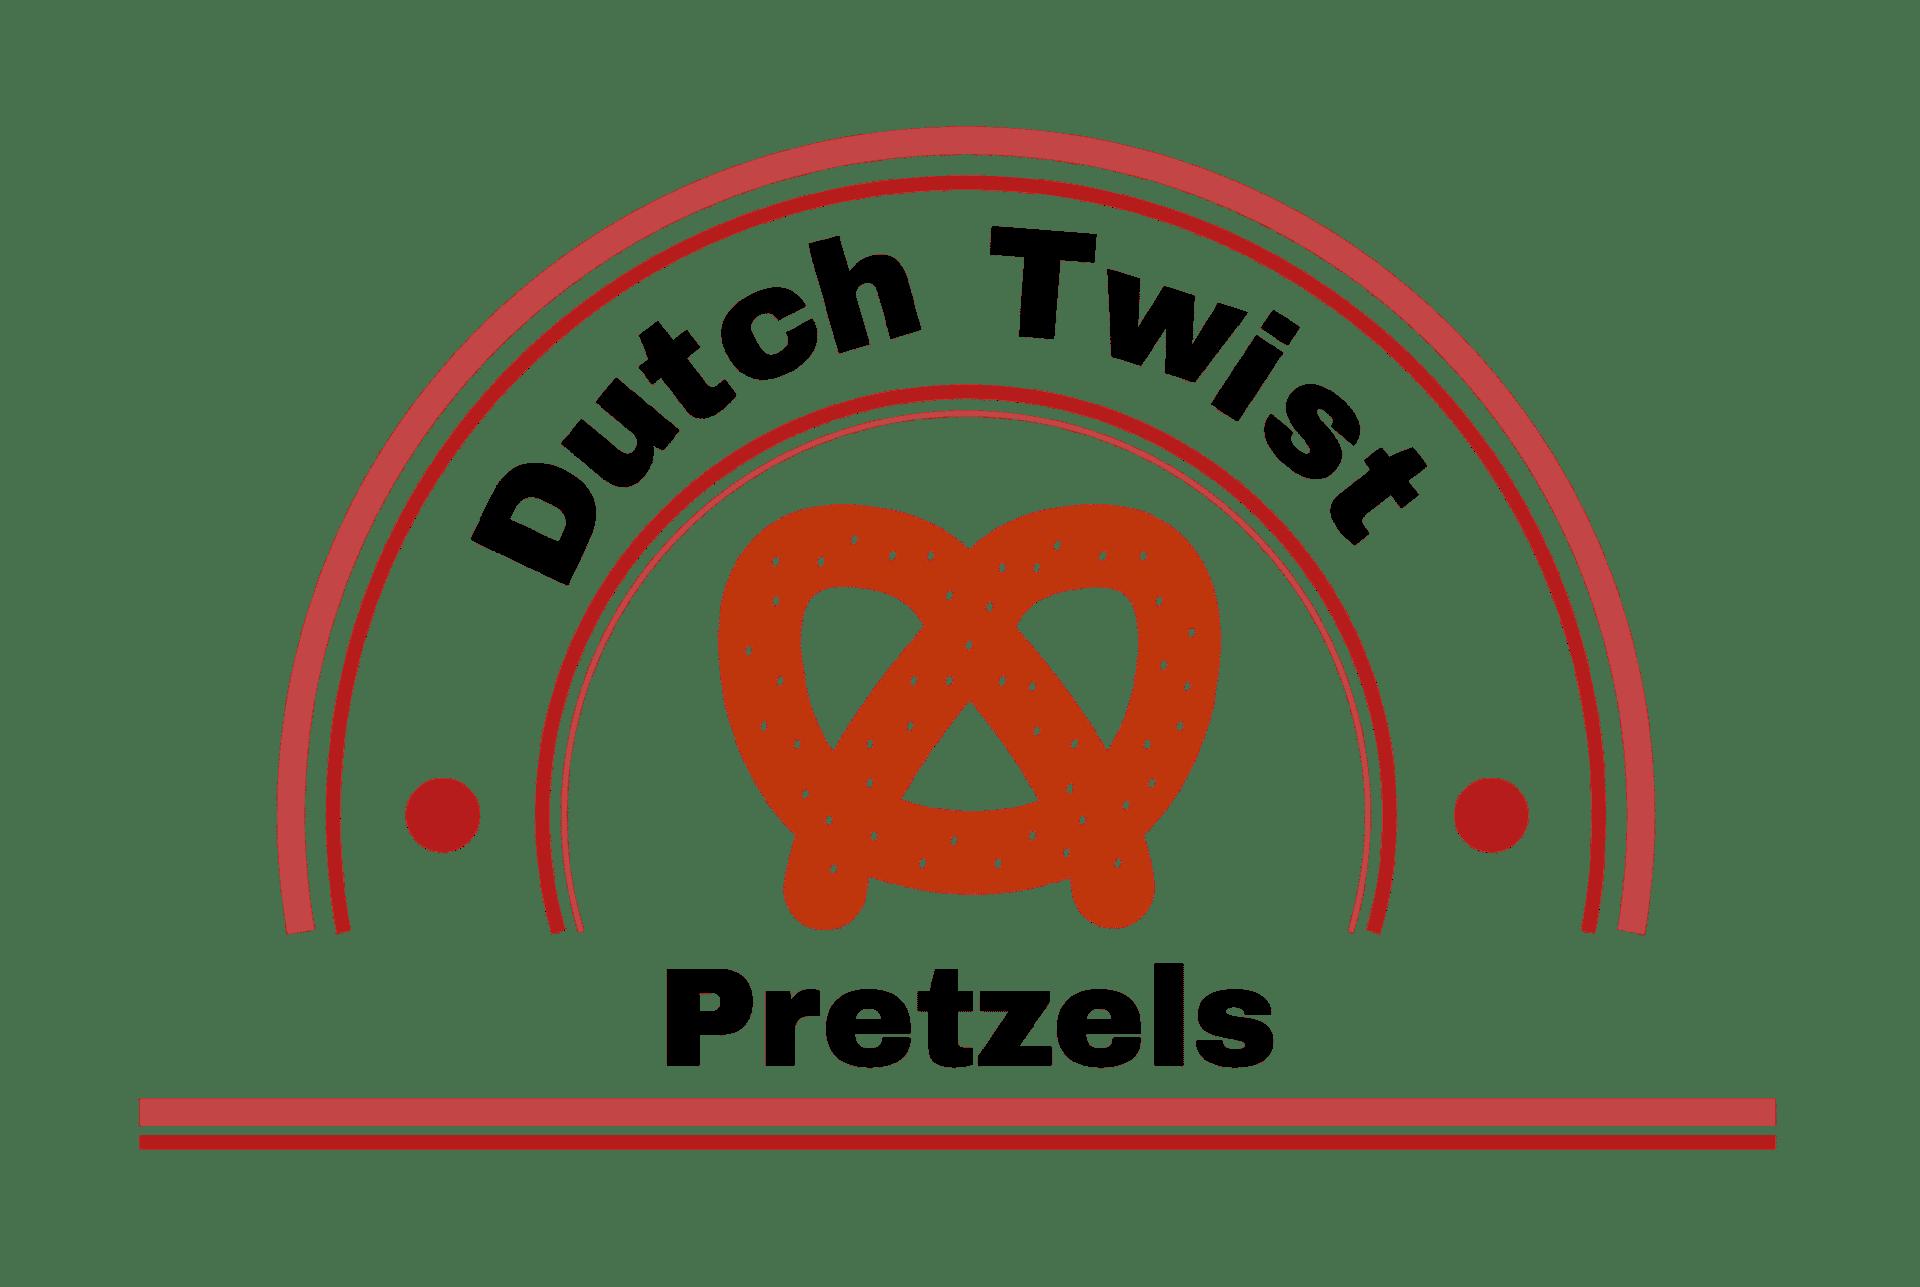 Dutch Twist logo